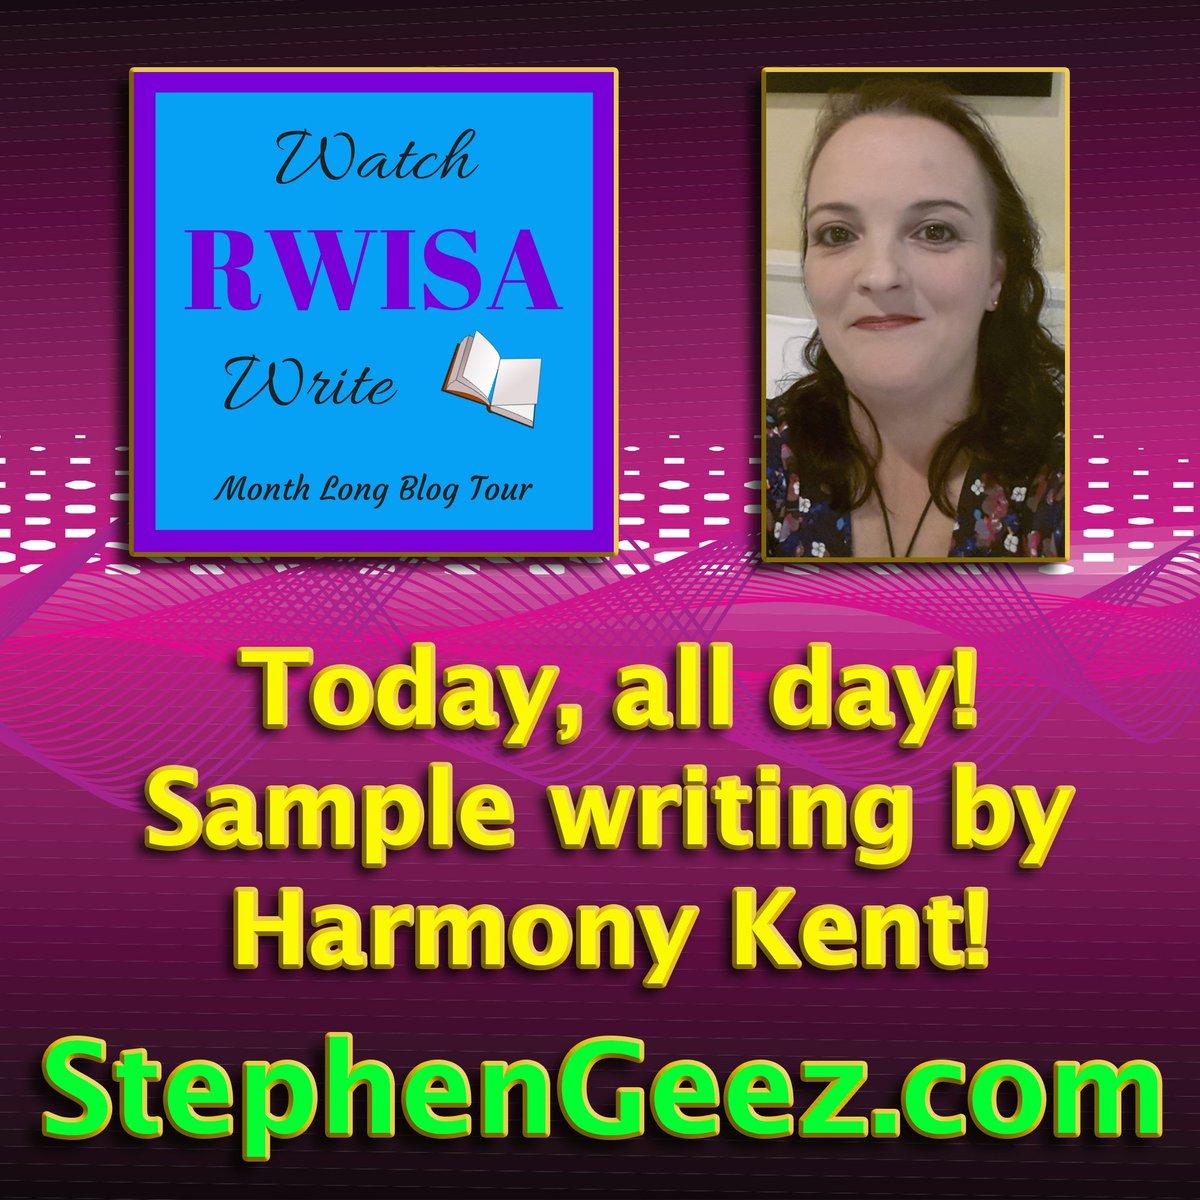 Discover guest-blogger Harmony Kent at  http:// StephenGeez.com  &nbsp;  . #RRBC #RWISA #Author #blogger @harmony_kent @StephenGeez<br>http://pic.twitter.com/cEjS8IoOTl